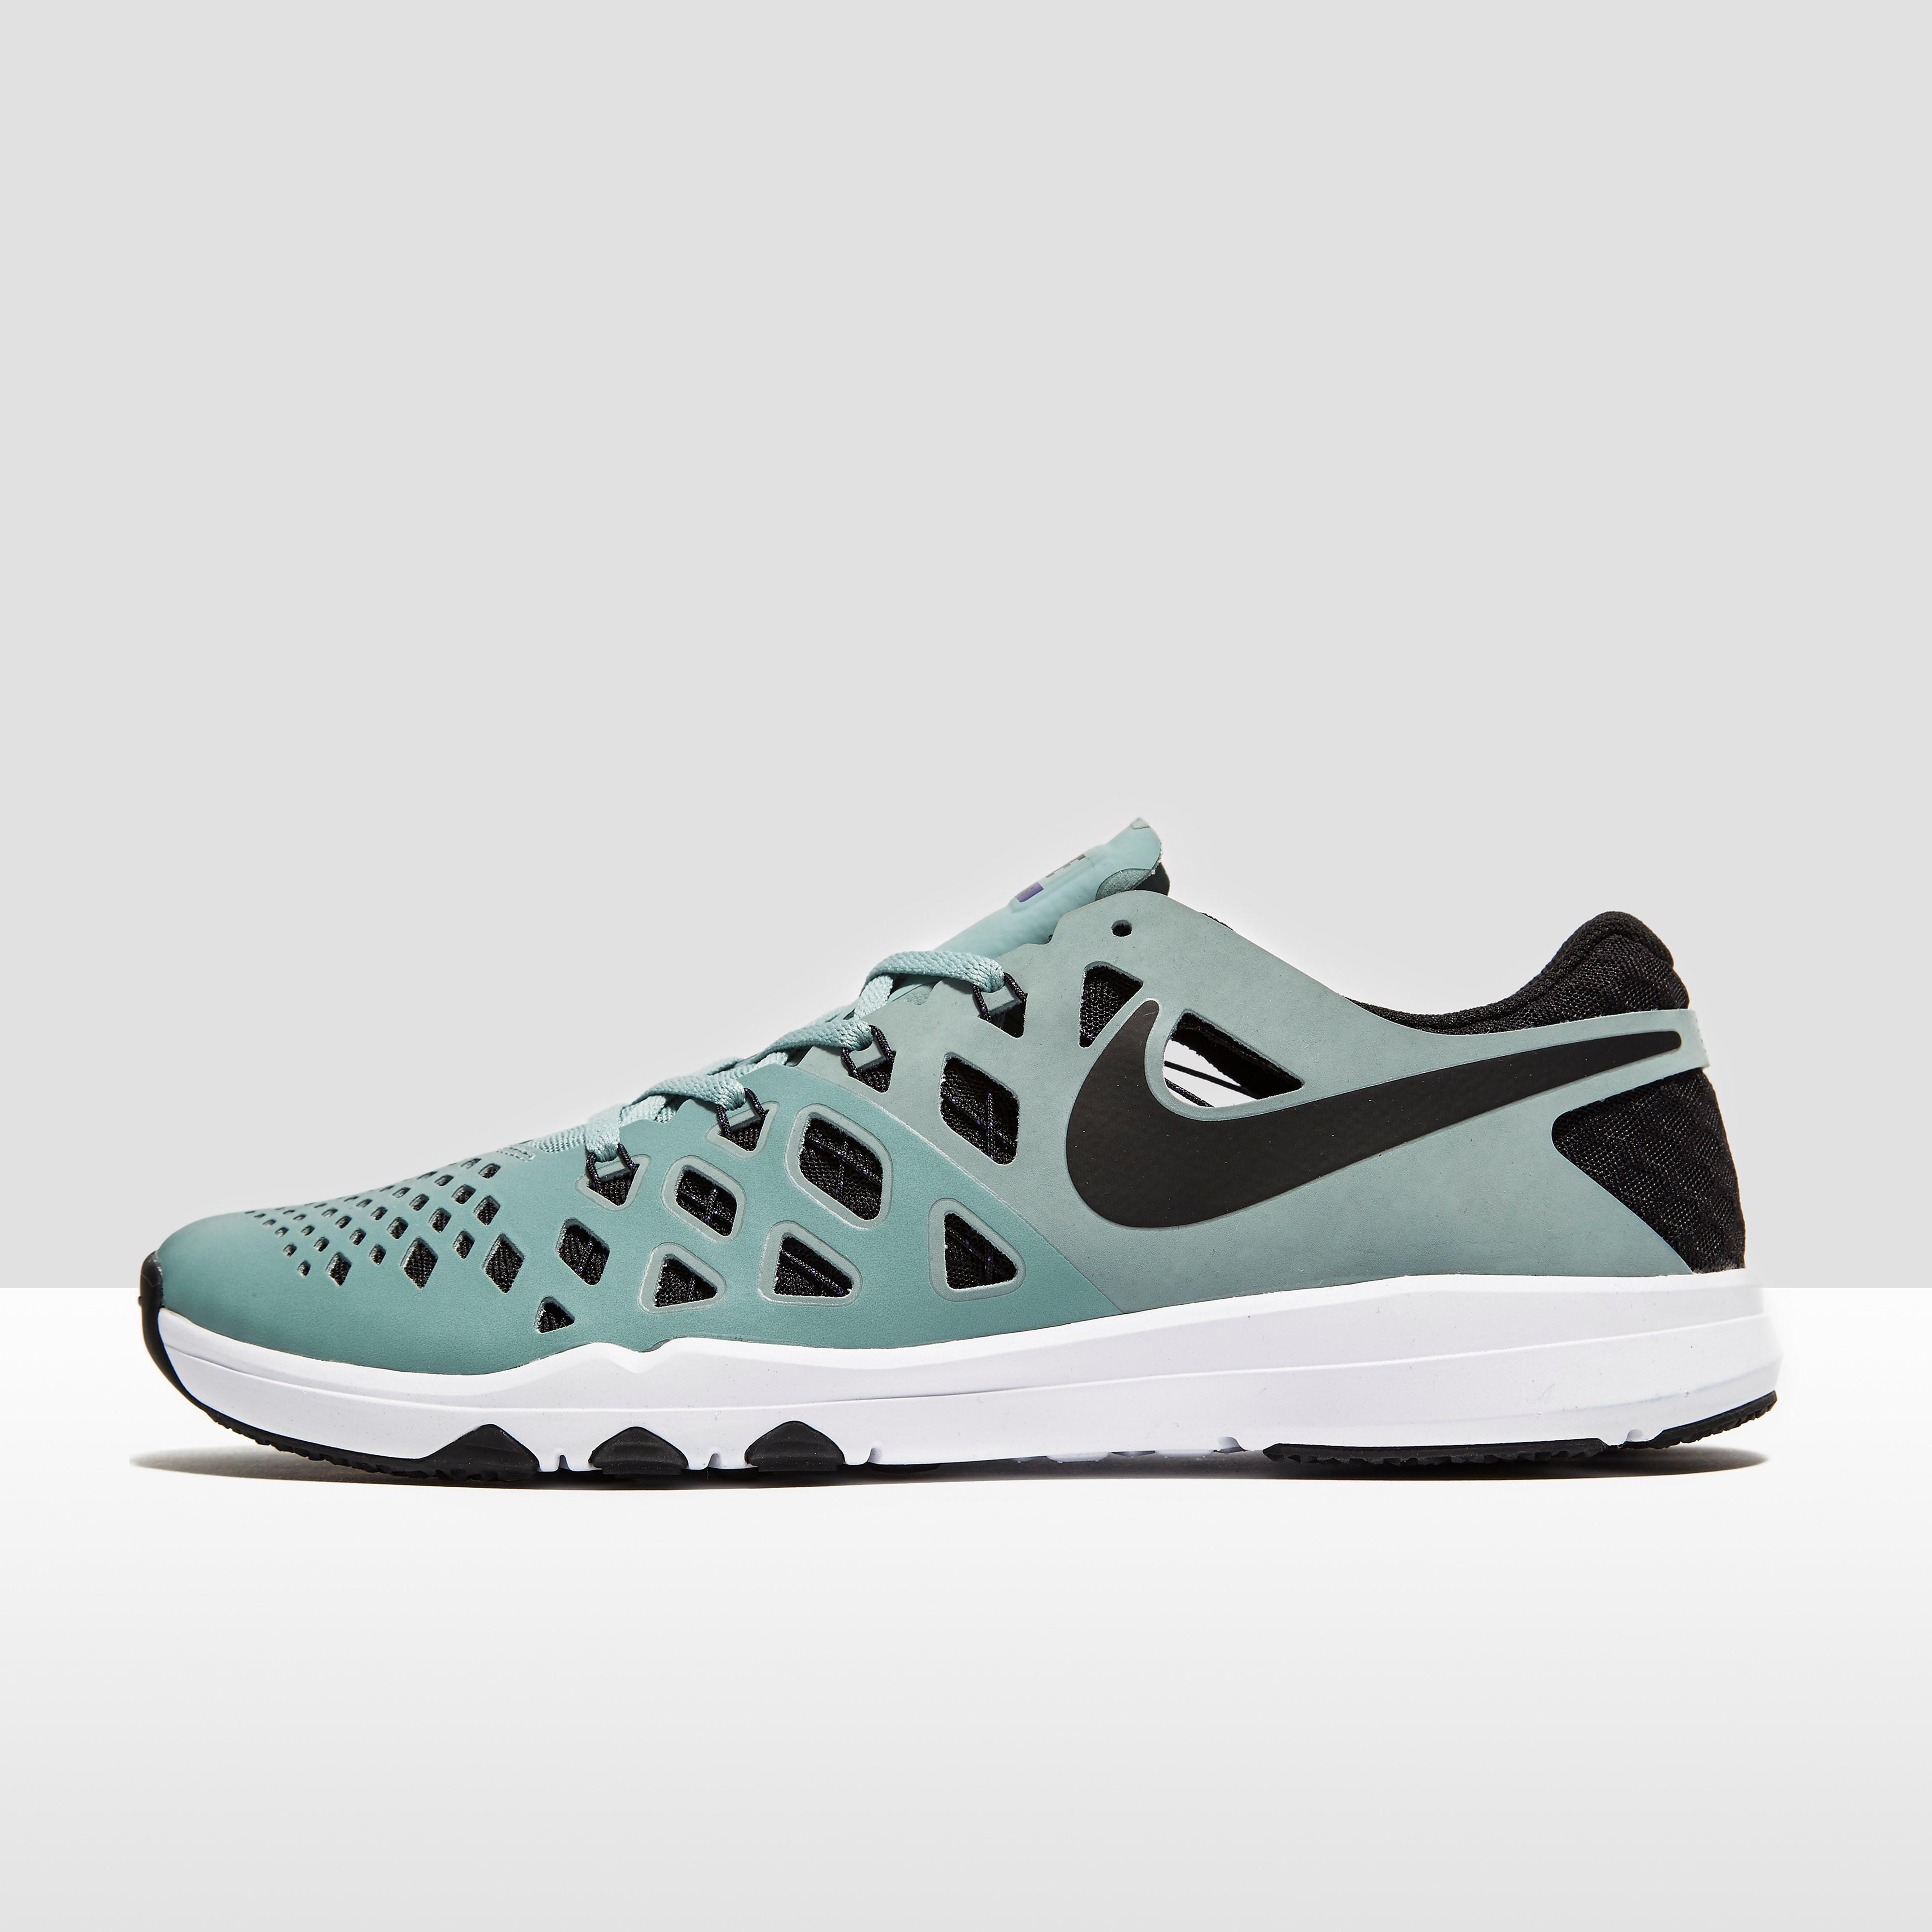 Nike Nike Train Speed 4 Men's Training Shoes